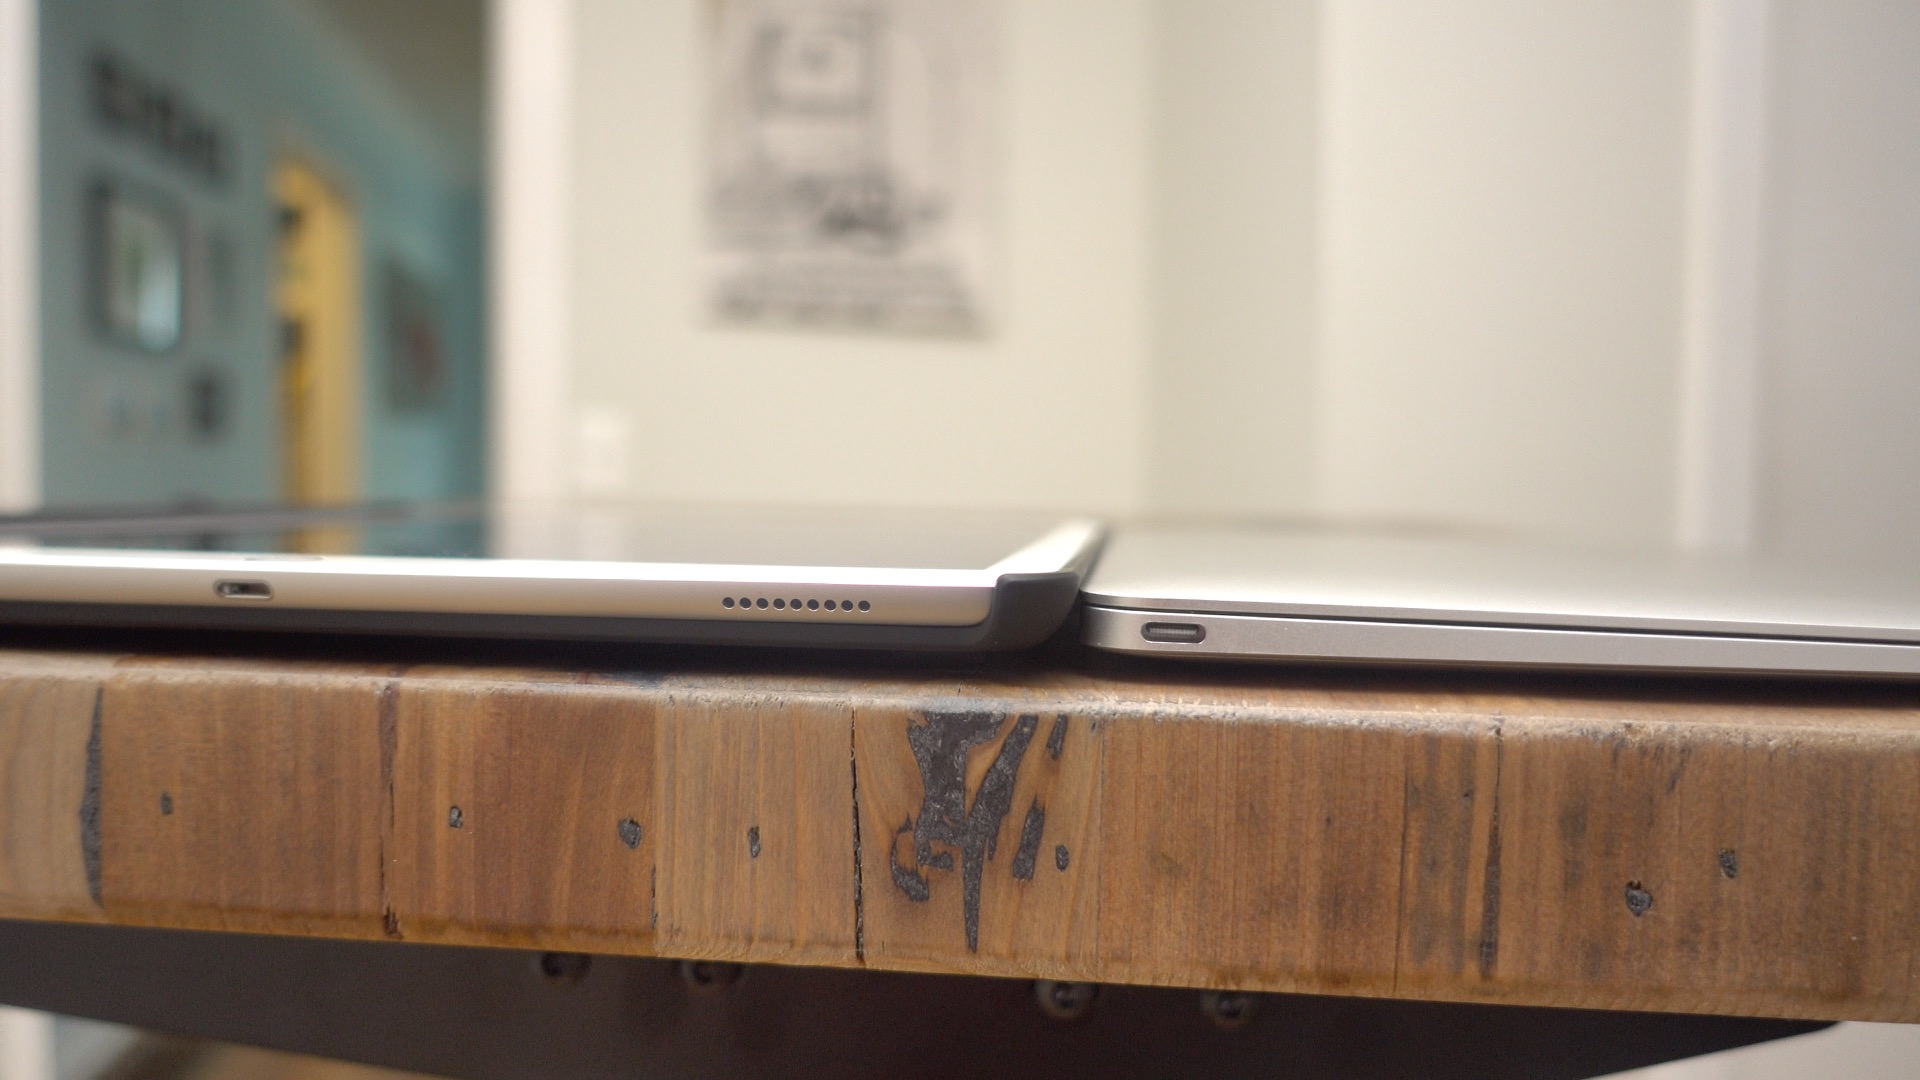 MacBook vs iPad Razer